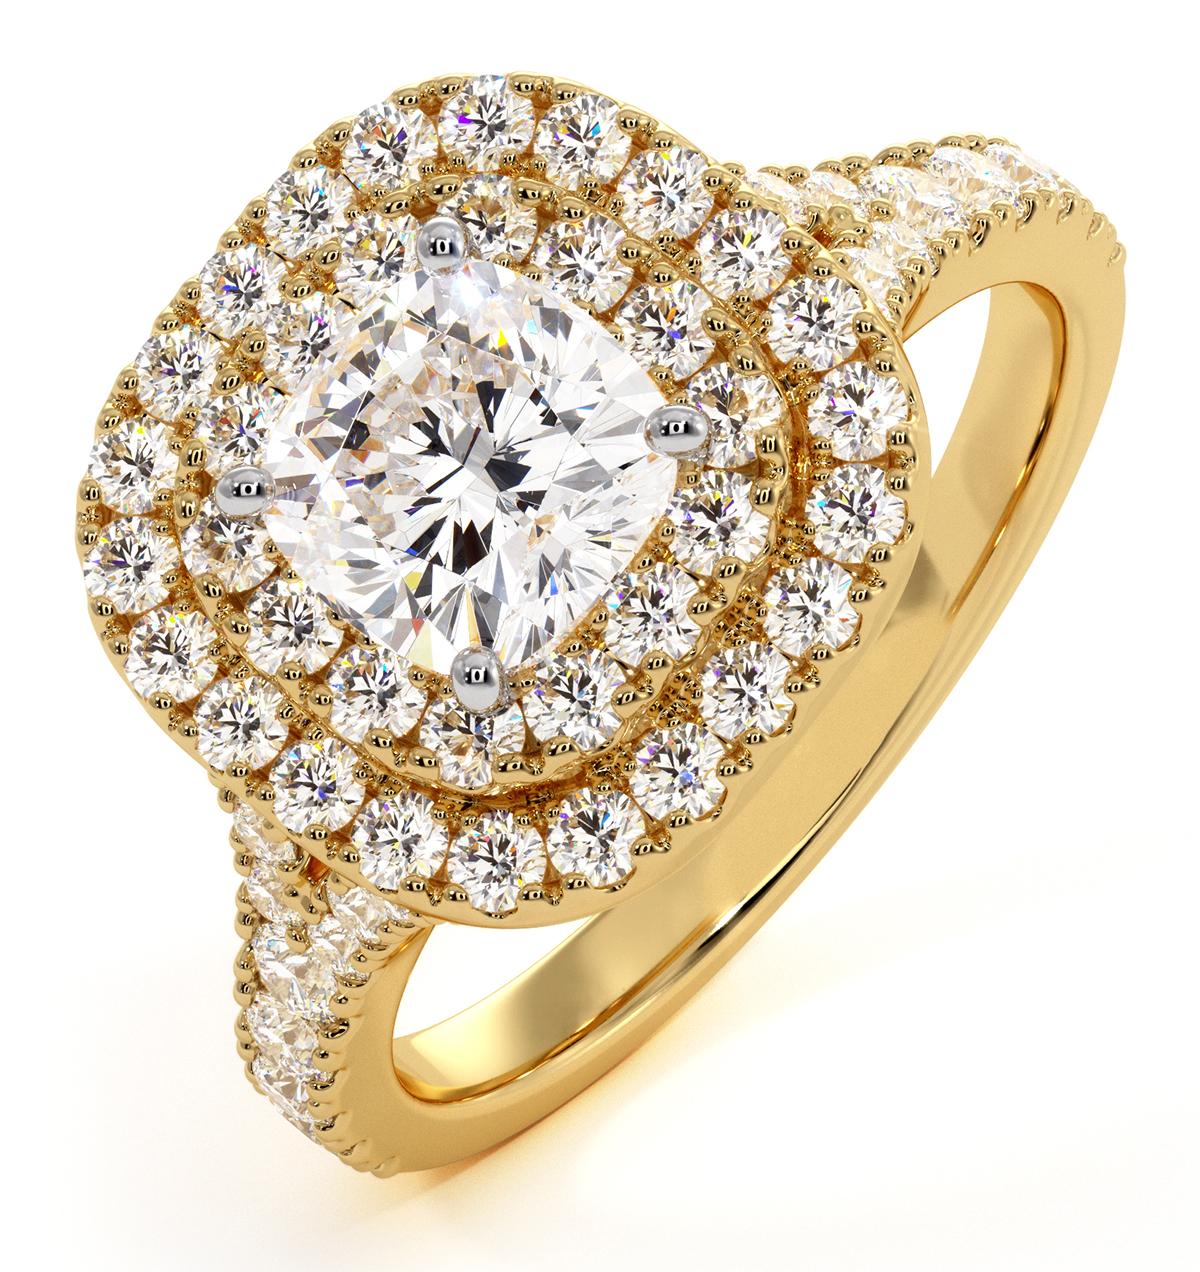 Anastasia GIA Diamond Halo Engagement Ring in 18K Gold 1.45ct G/SI1 - image 1